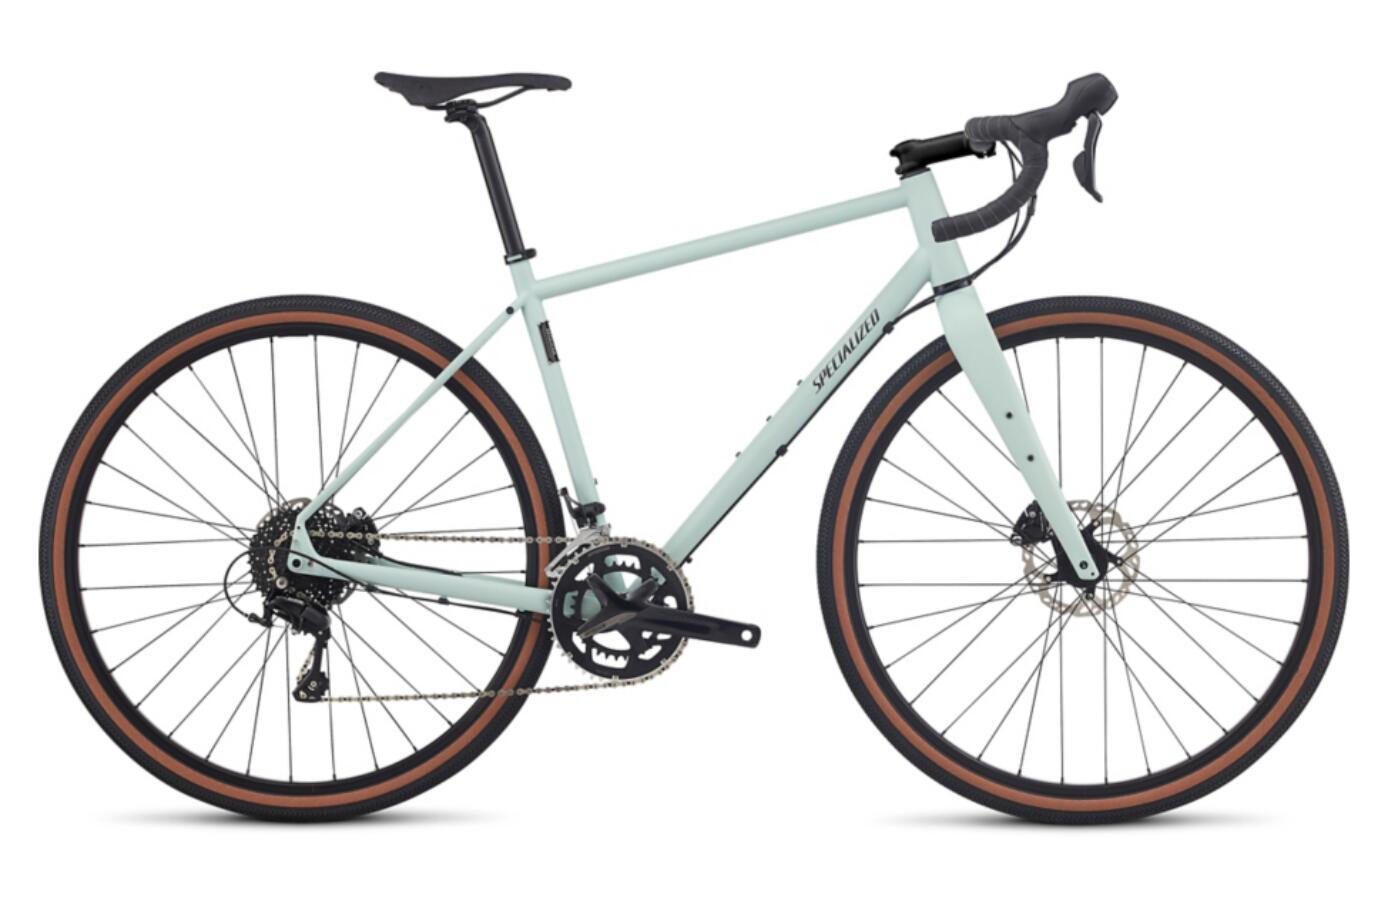 2017 Sequoia Elite Urban Bike